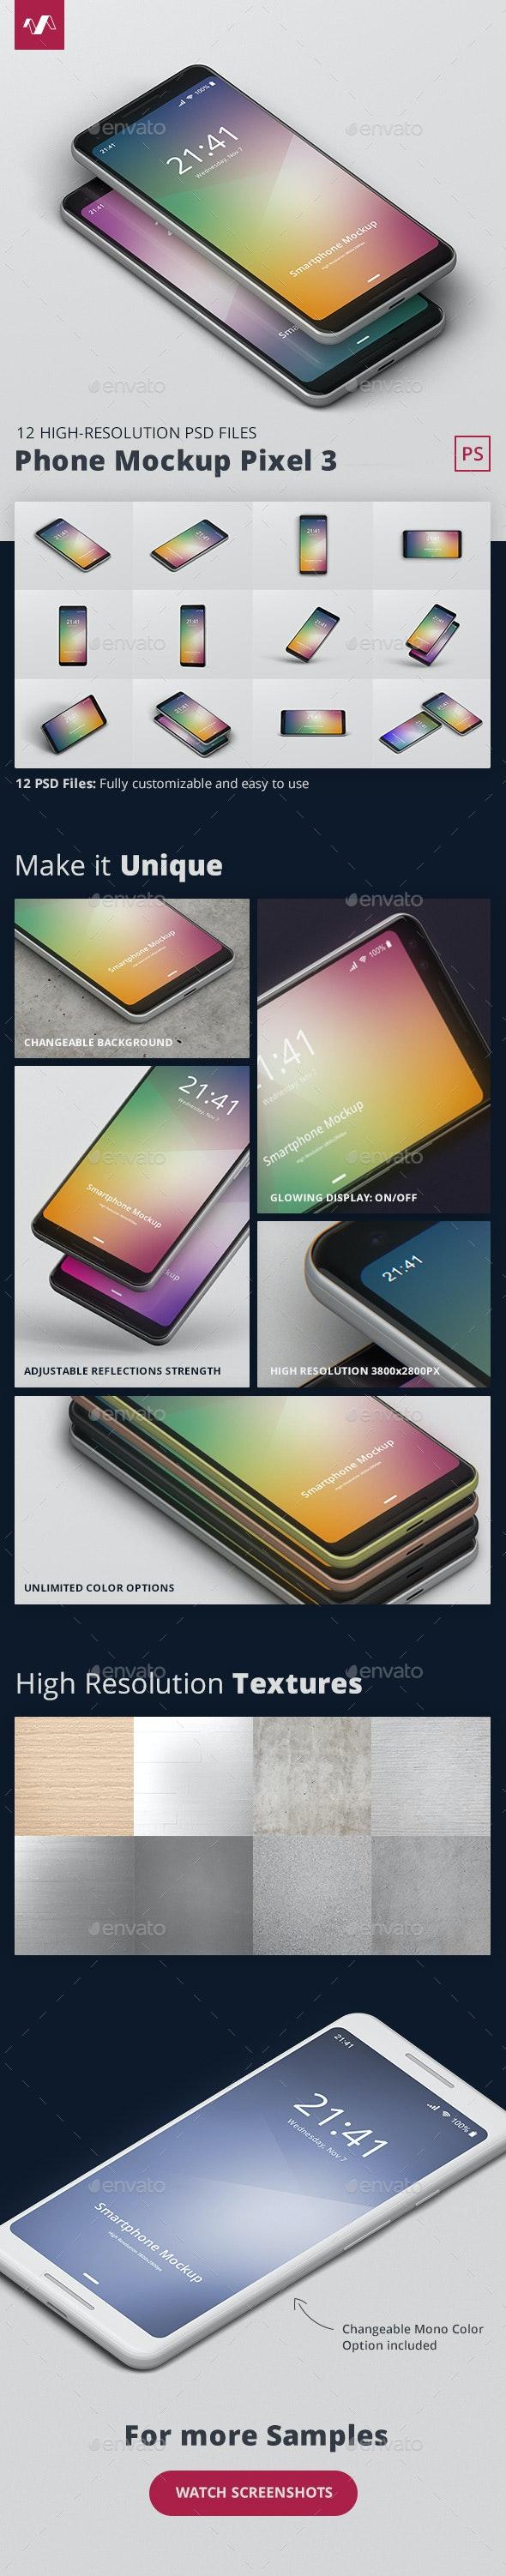 Smart Phone Mockup Pixel 3 - Mobile Displays